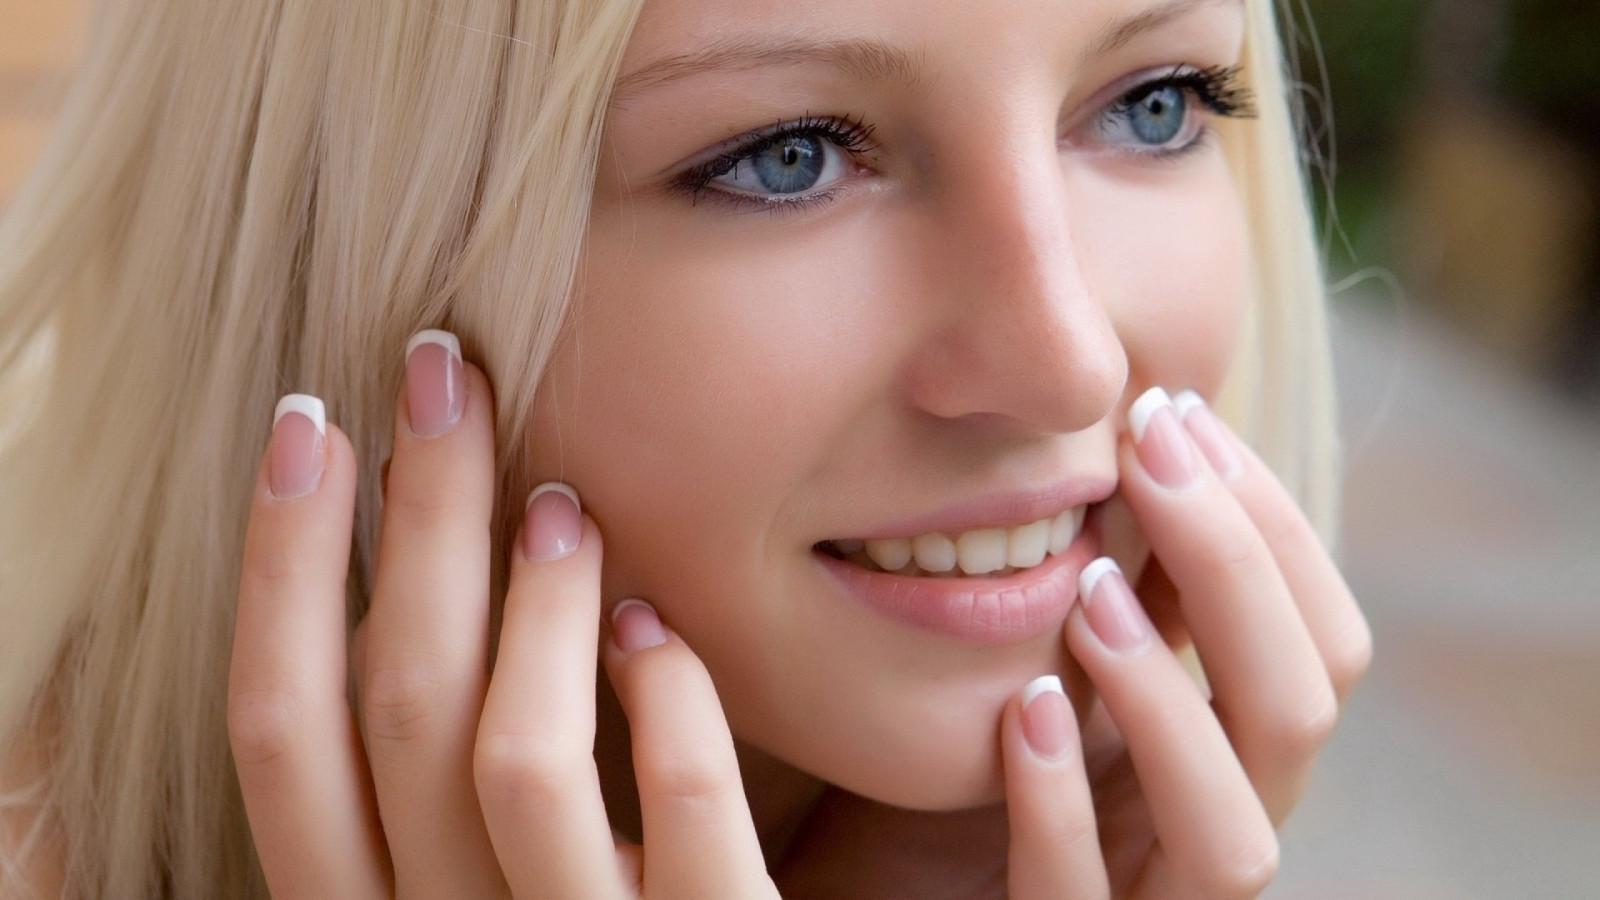 Wallpaper Face Women Model Singer Blue Mouth Nose: Wallpaper : Face, Women, Model, Blonde, Depth Of Field